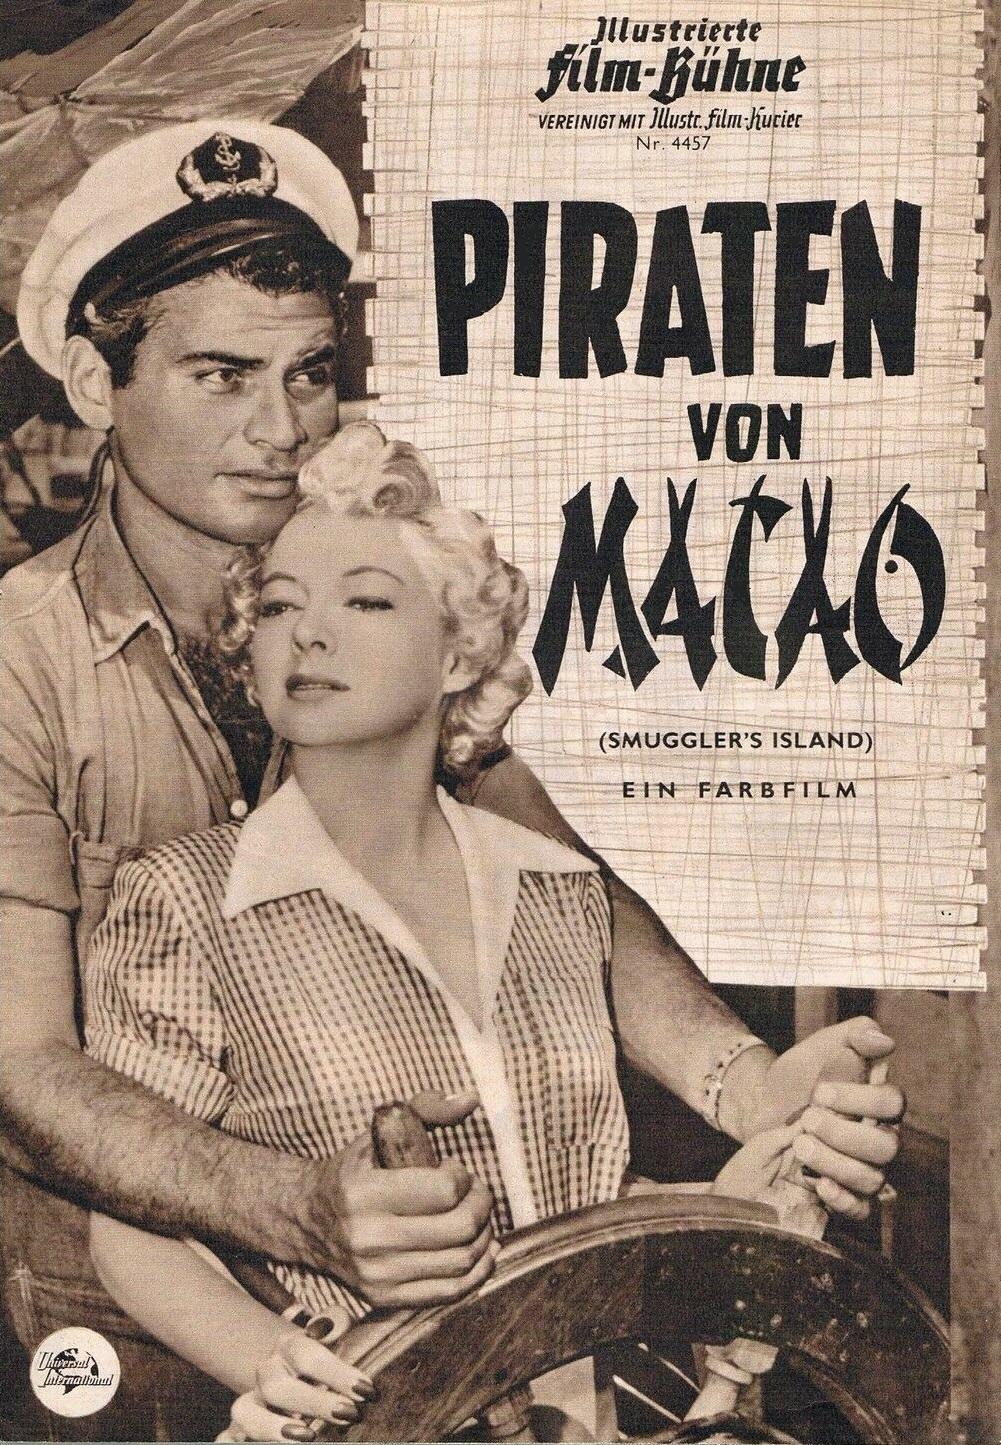 Jeff Chandler and Evelyn Keyes in Smuggler's Island (1951)